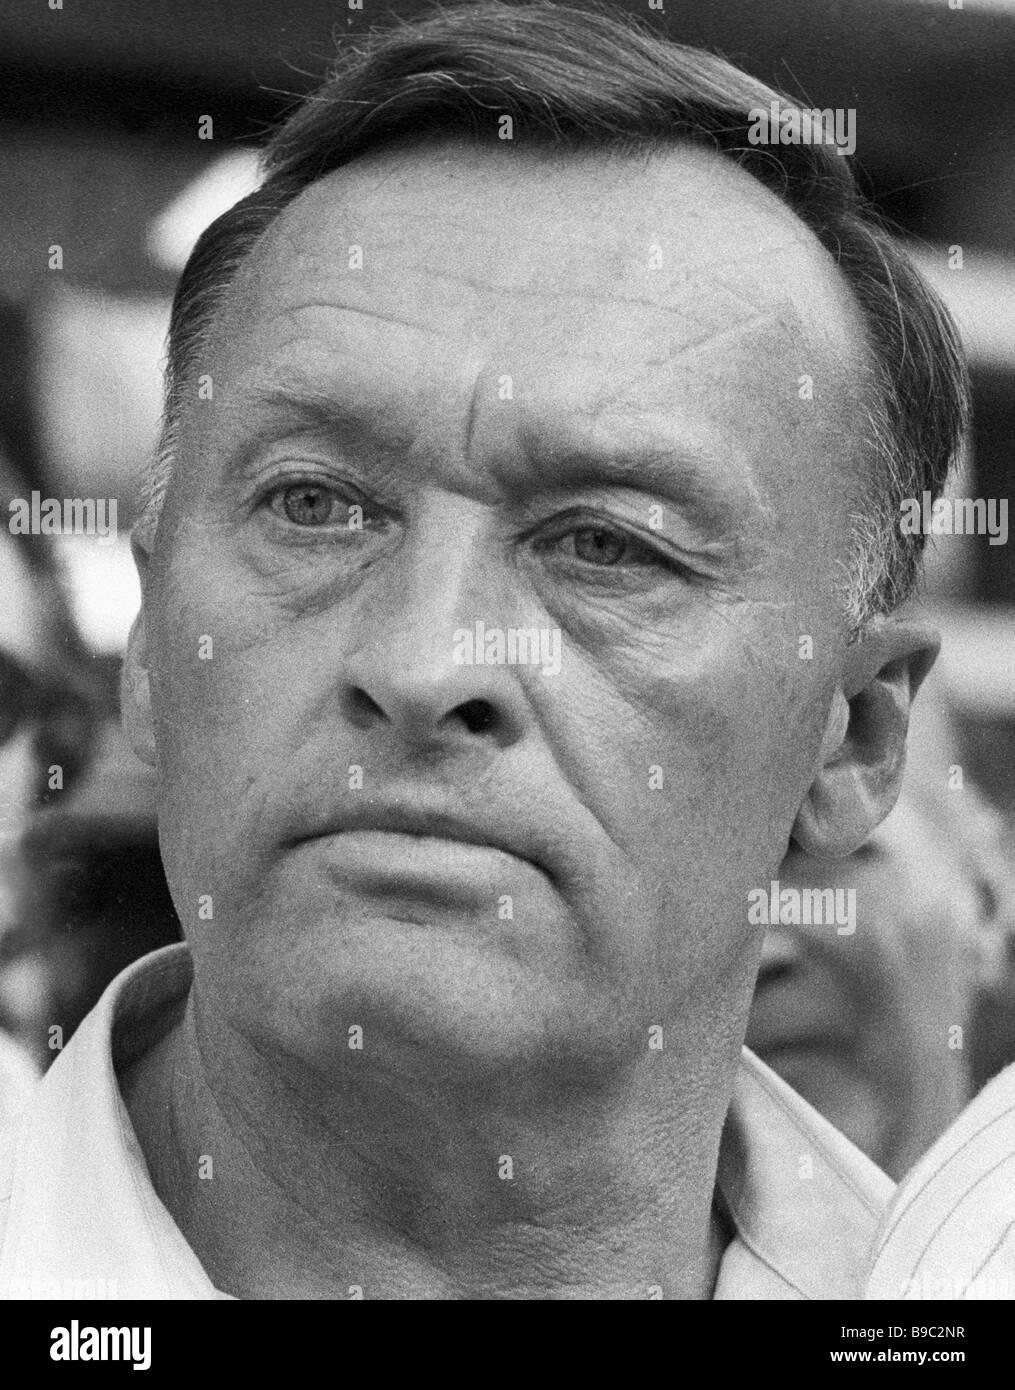 People s Deputy KGB Major General retired Oleg Kalugin - Stock Image